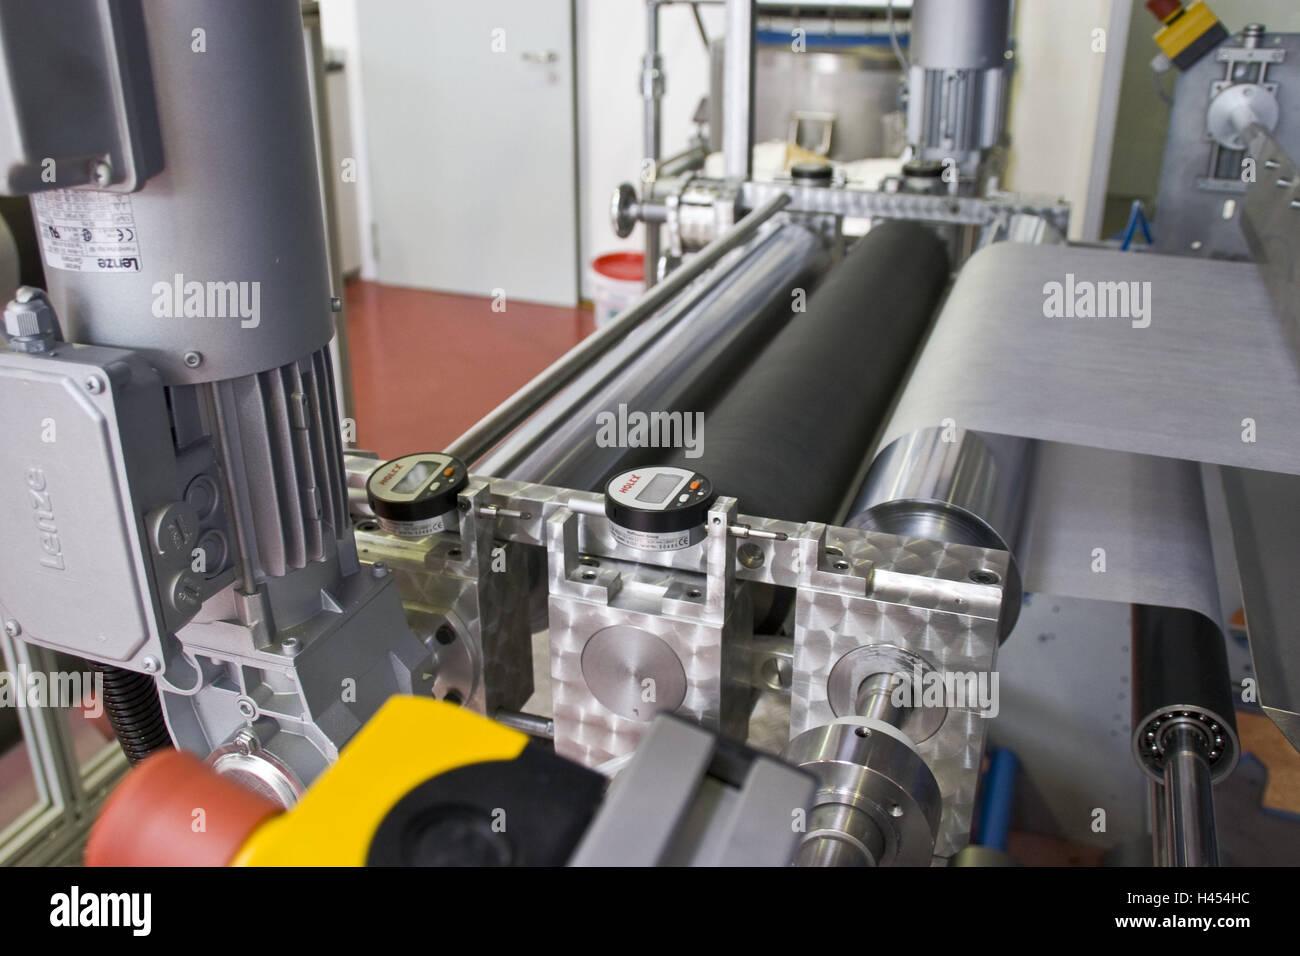 Chemicals companies, machine, Nanofolie, Germany, North Rhine-Westphalia, Marl, Evonik, company, nanotechnology, - Stock Image